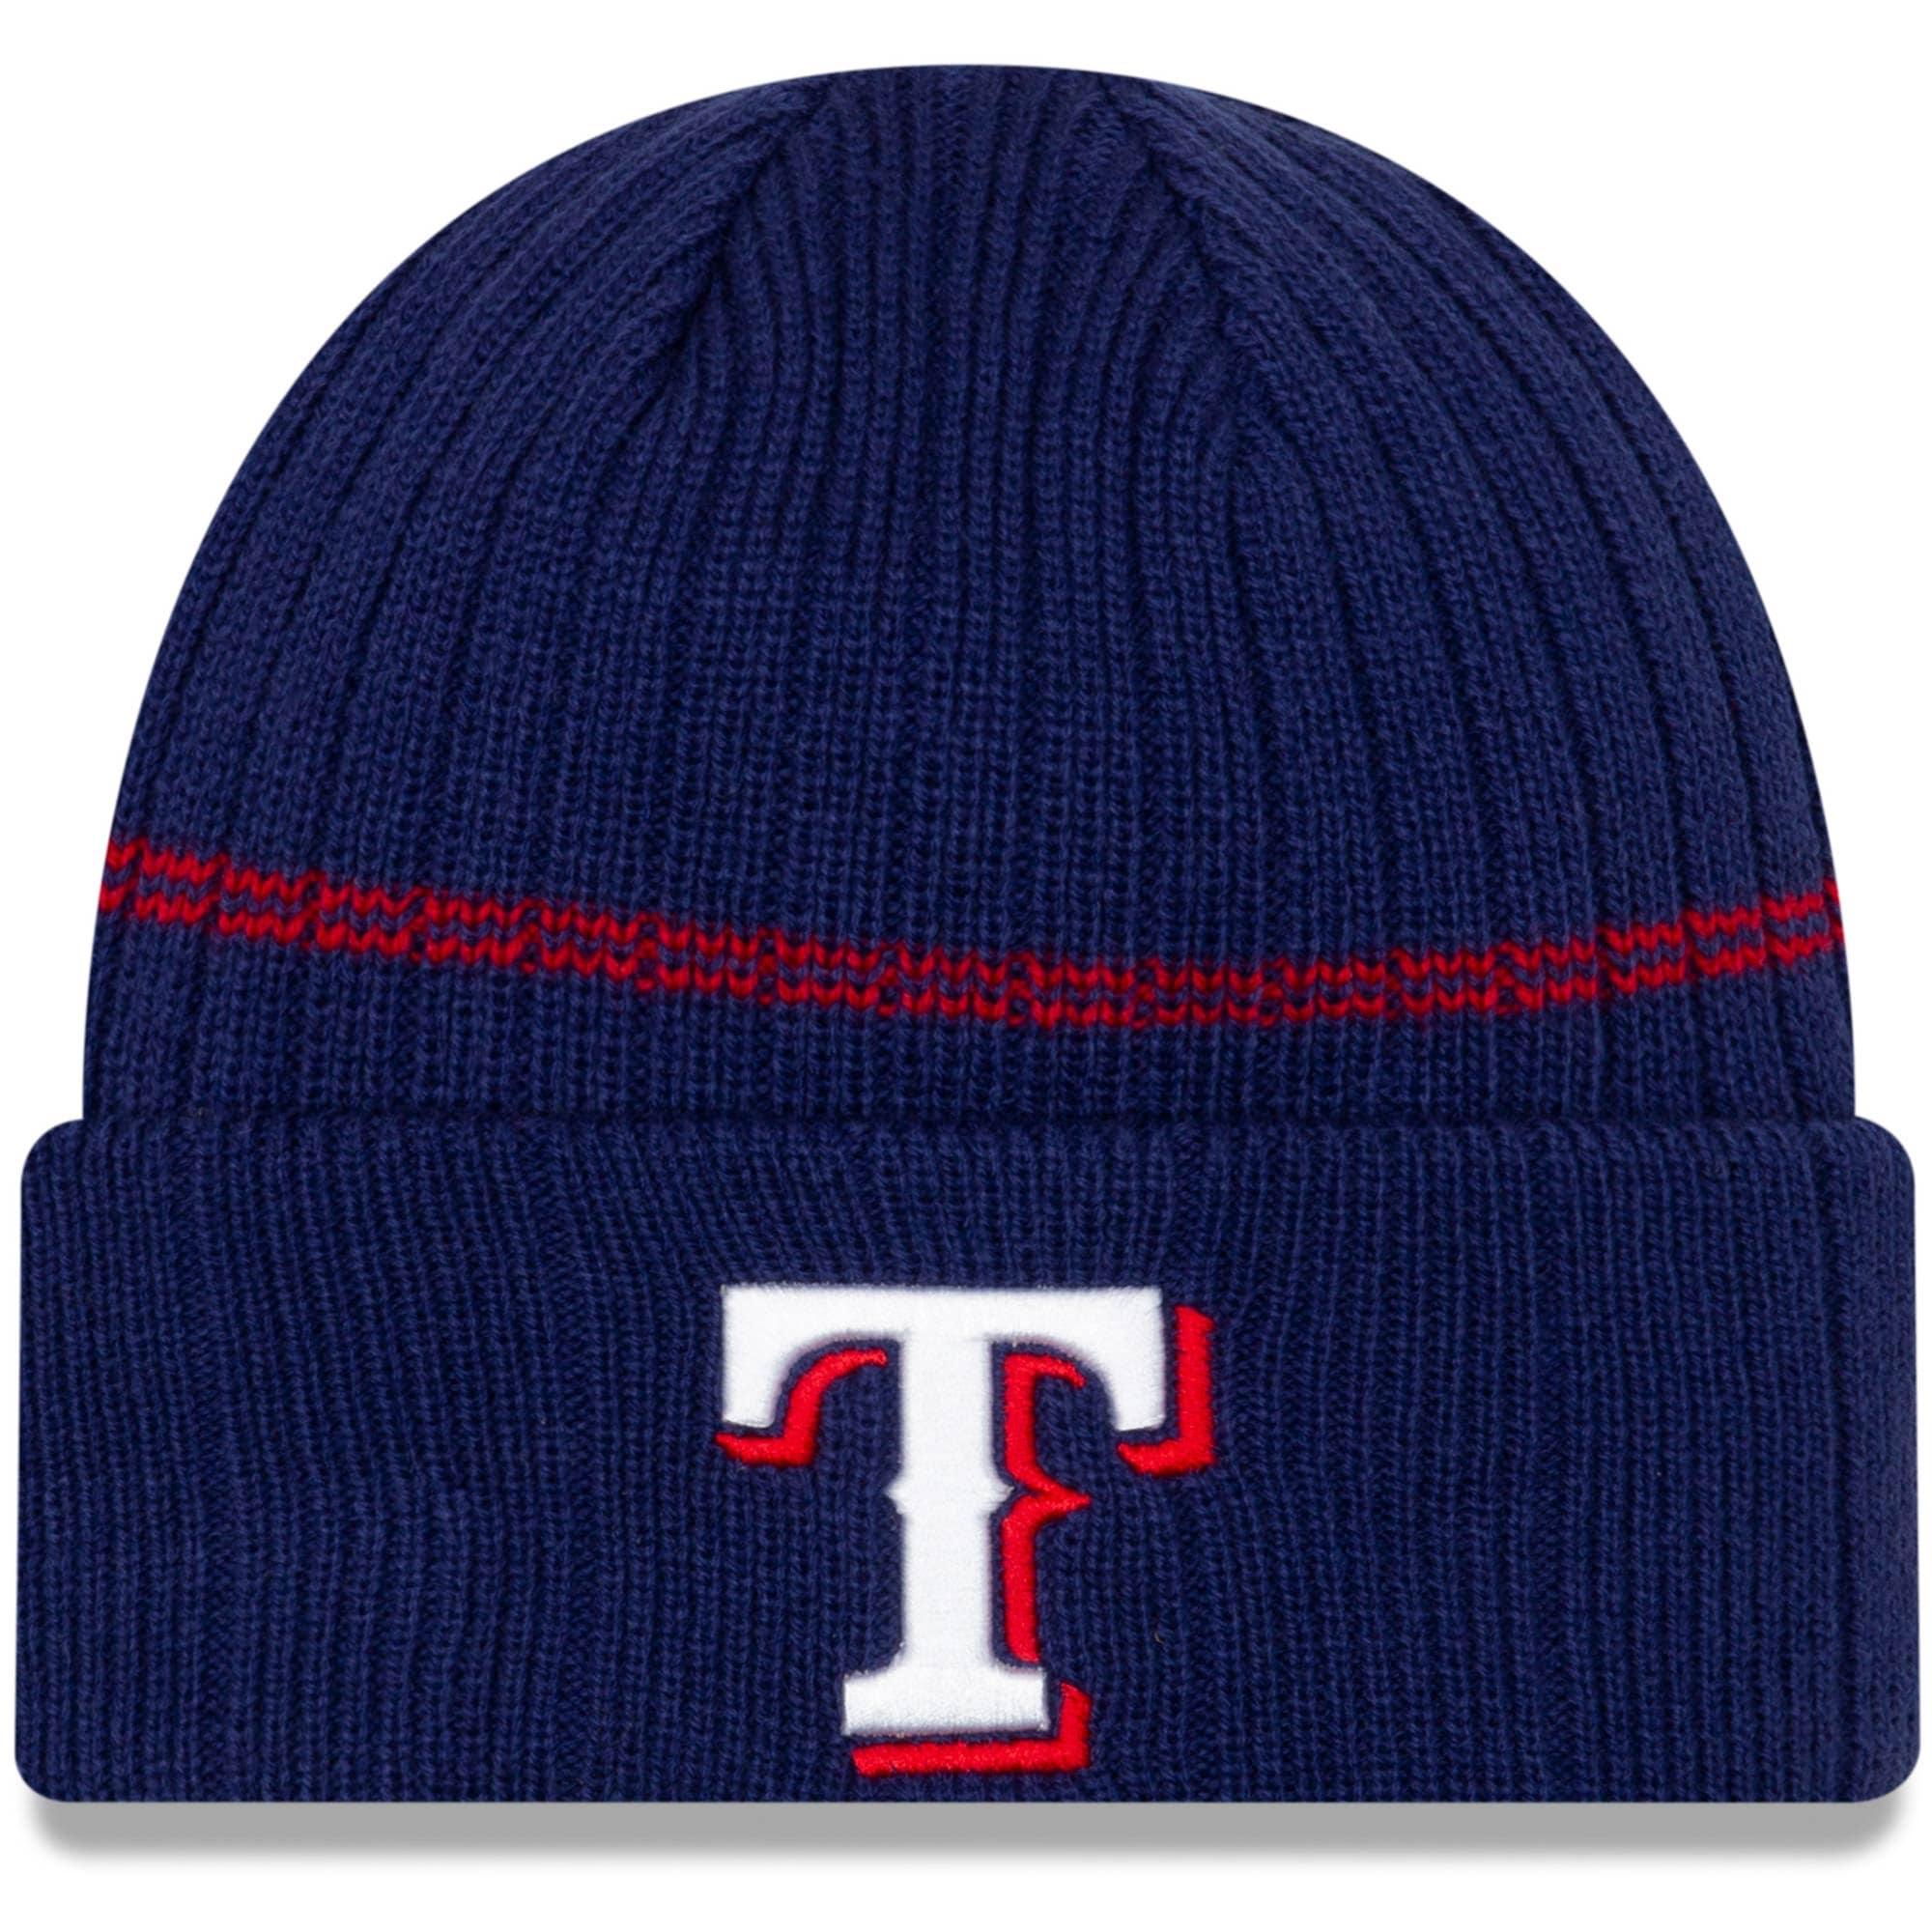 Texas Rangers New Era Primary Logo On-Field Sport Cuffed Knit Hat - Navy